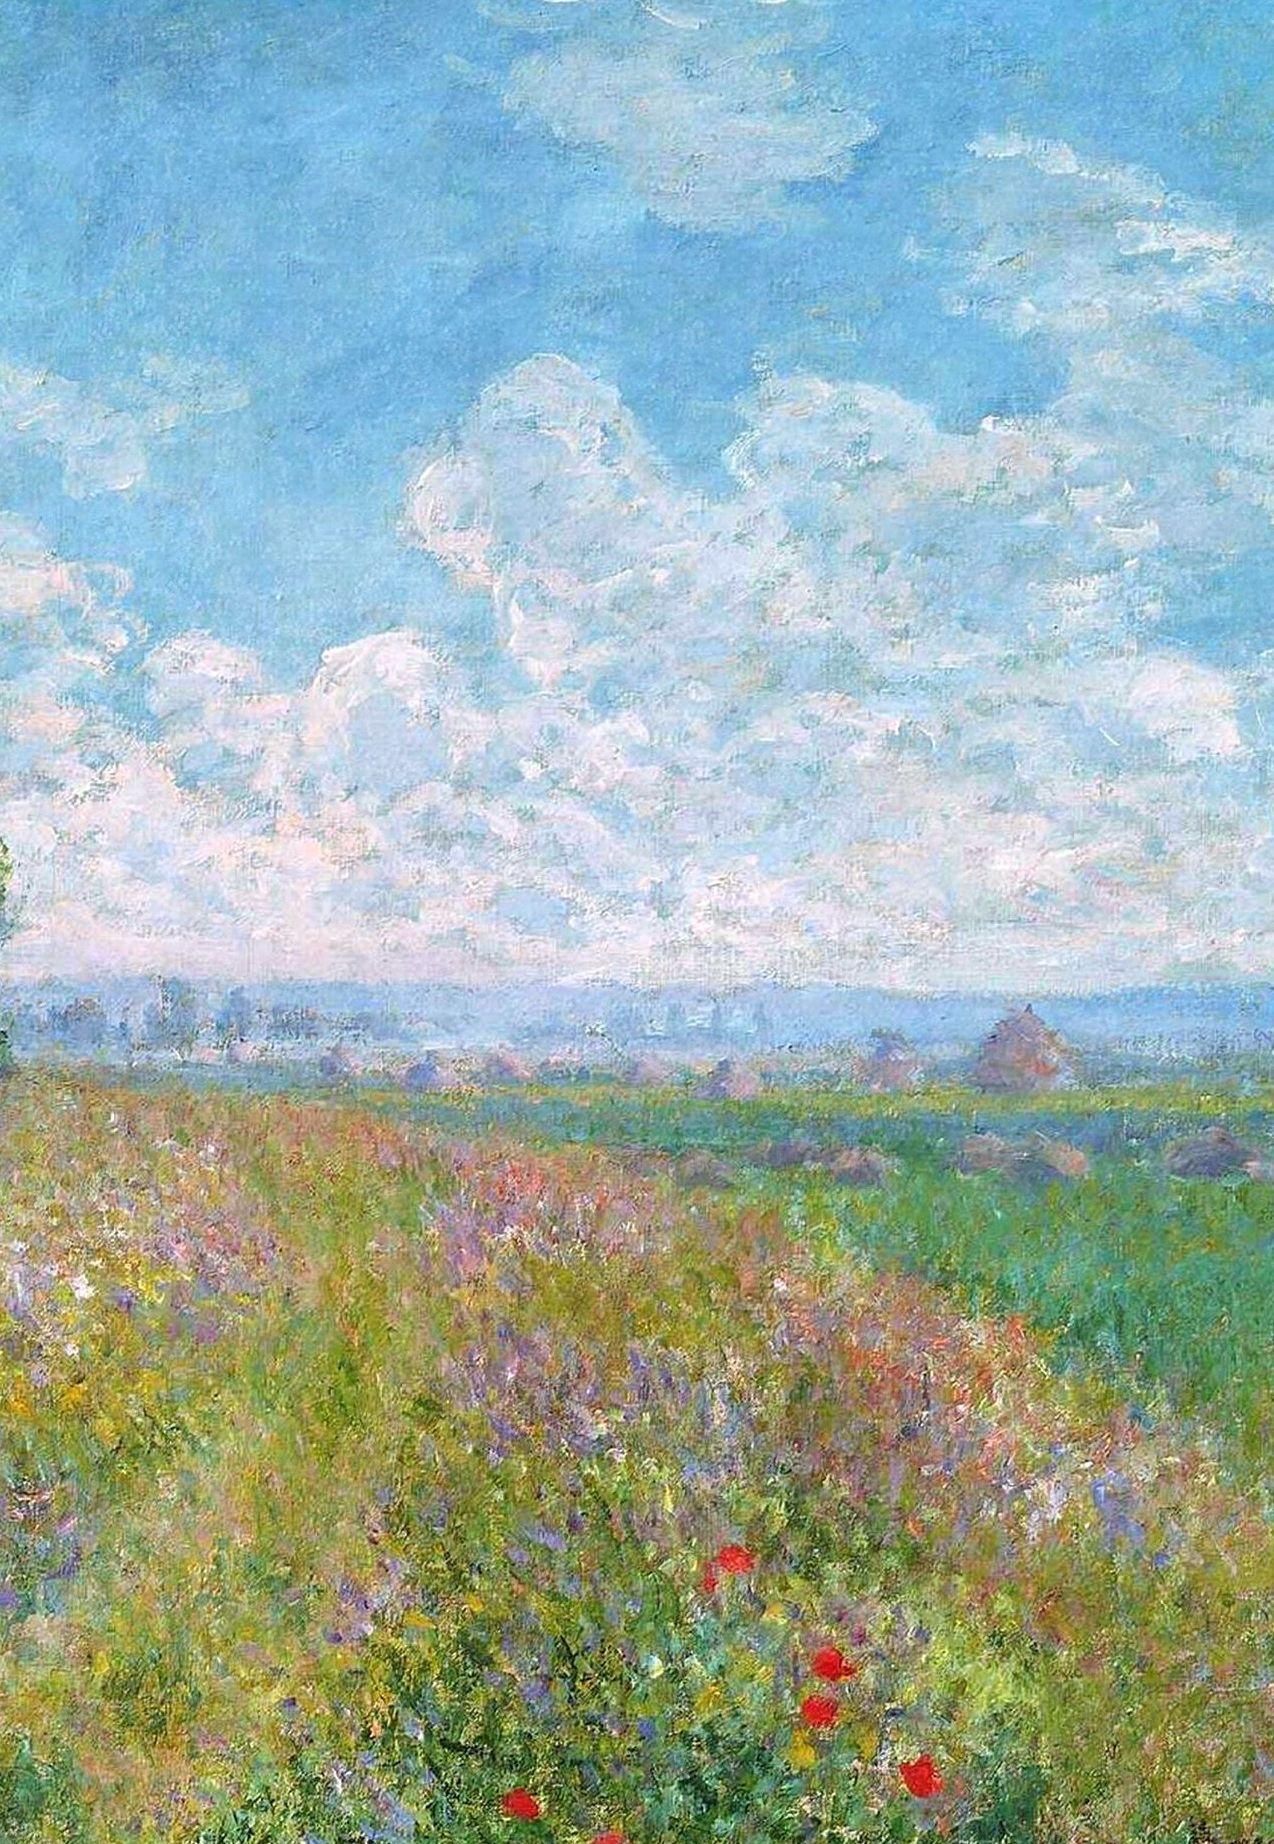 Landschaftsmalerei impressionismus  Meadow with Poplars' by Monet | art | Pinterest | Ballerina Malerei ...